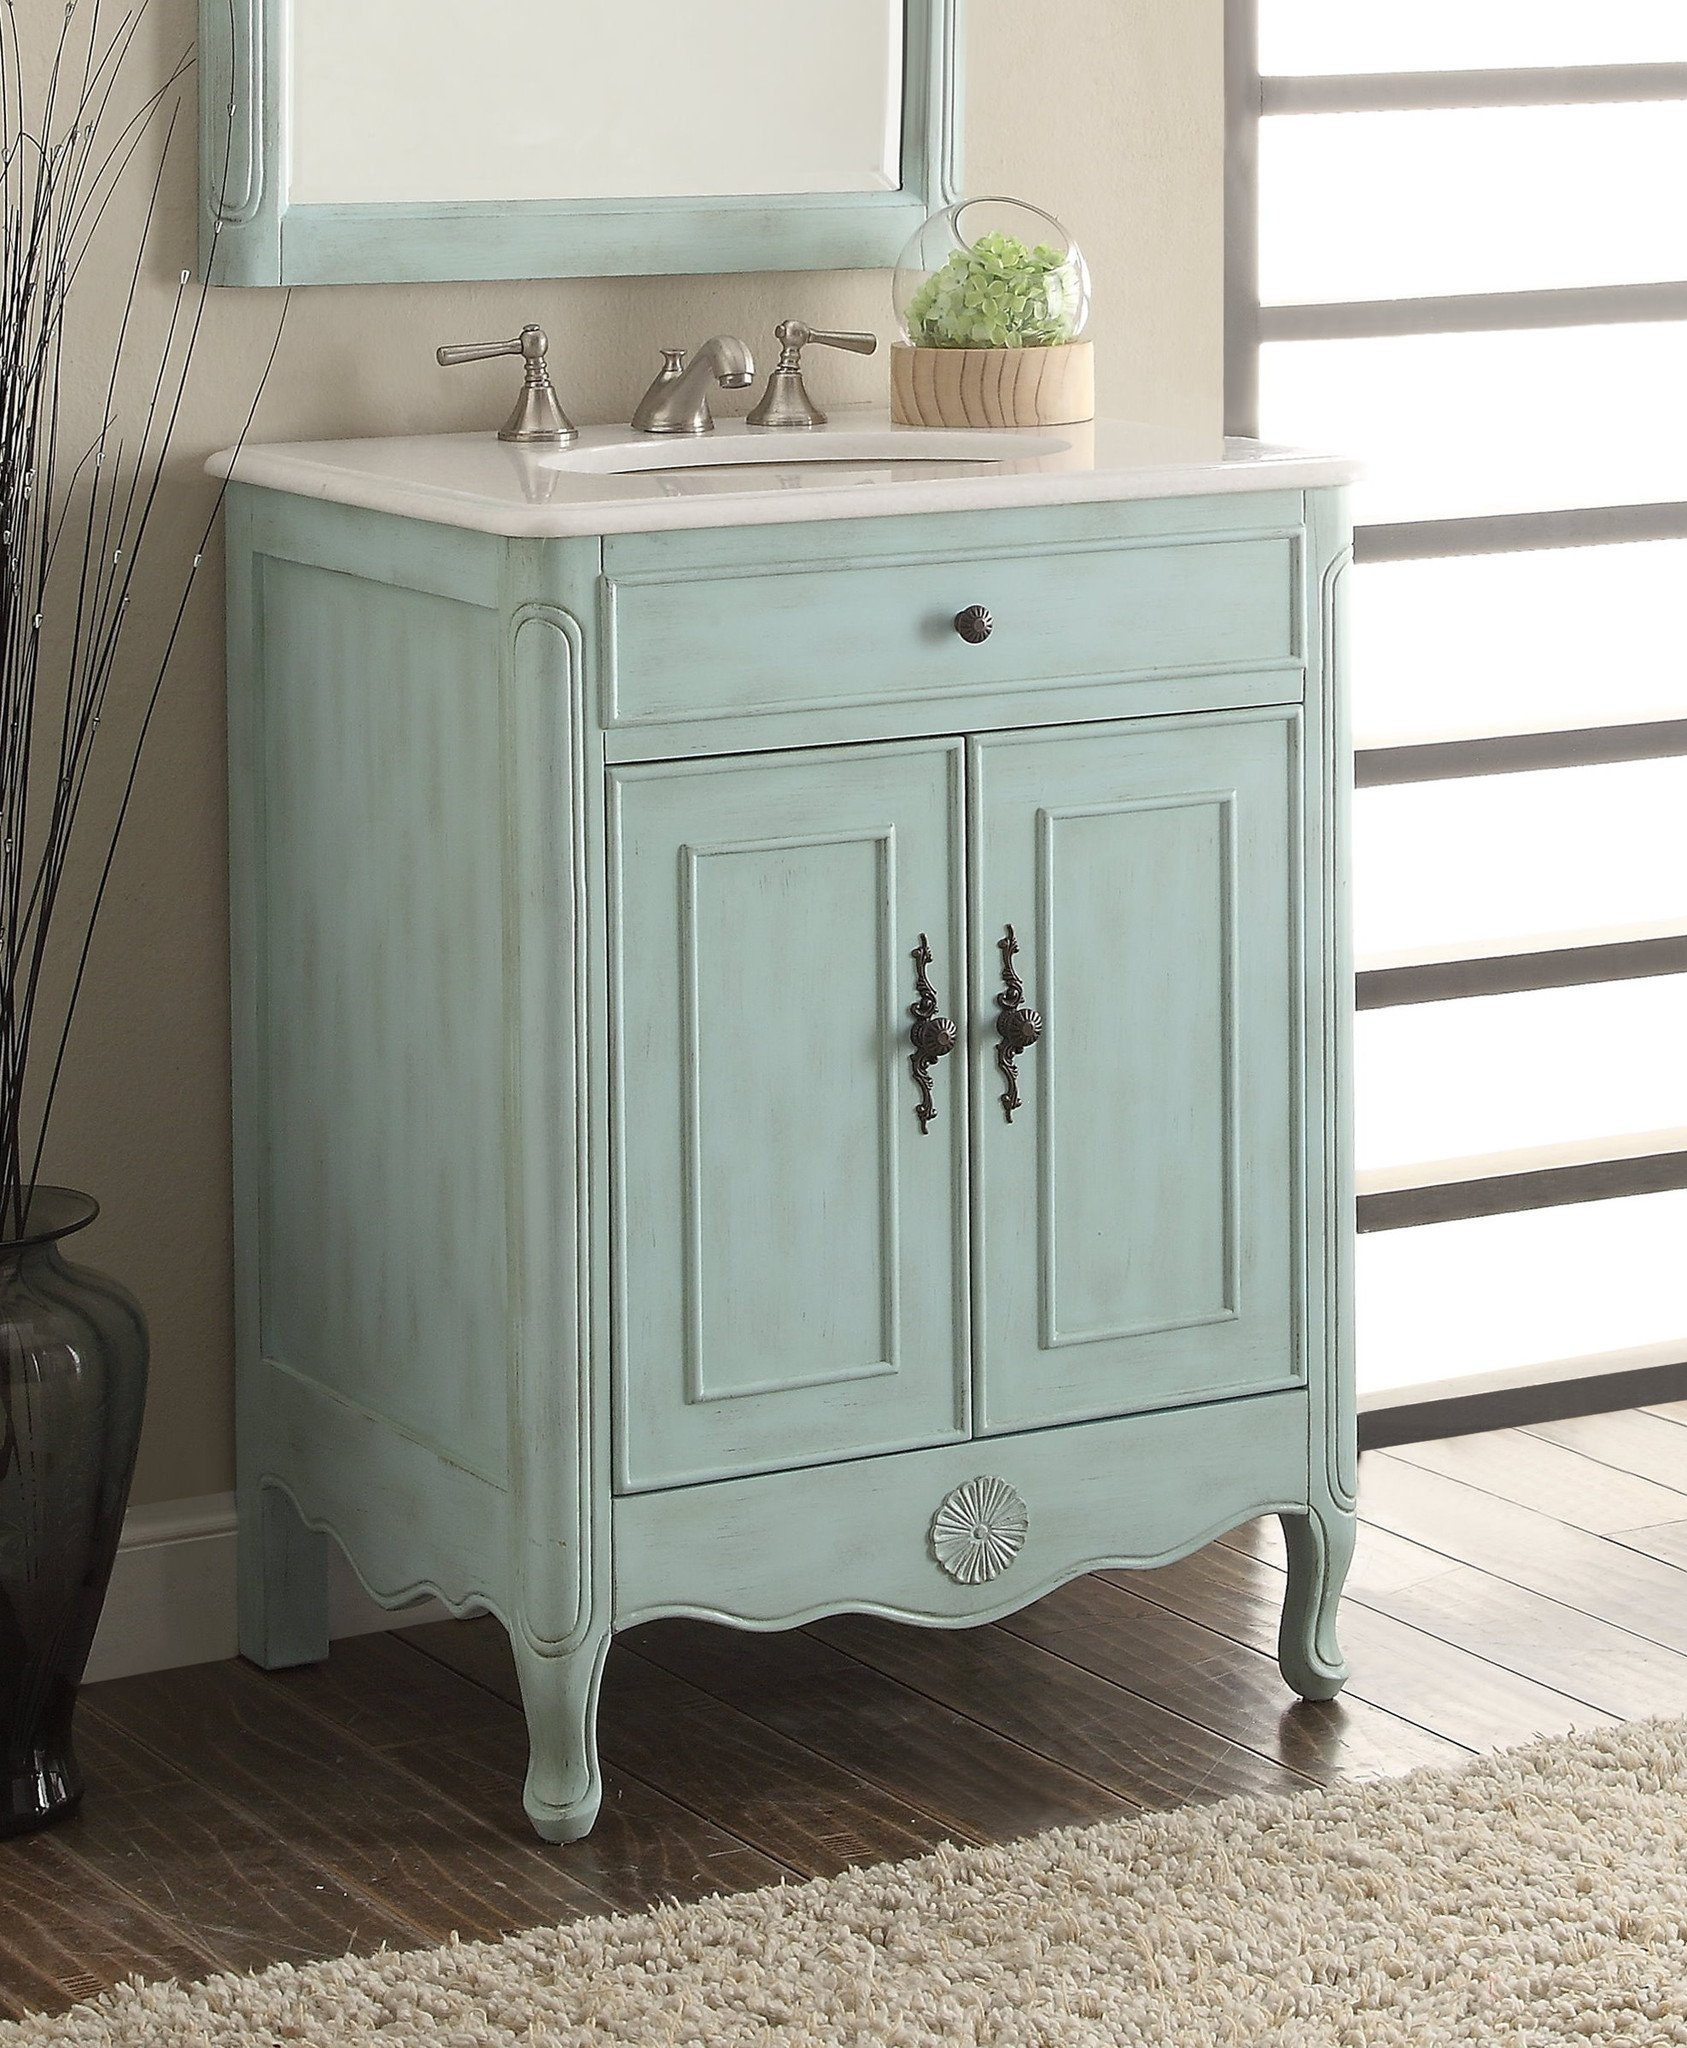 26 Benton Collection Daleville Light Blue Vintage Bathroom Vanity Hf 838lb Walmart Com Walmart Com